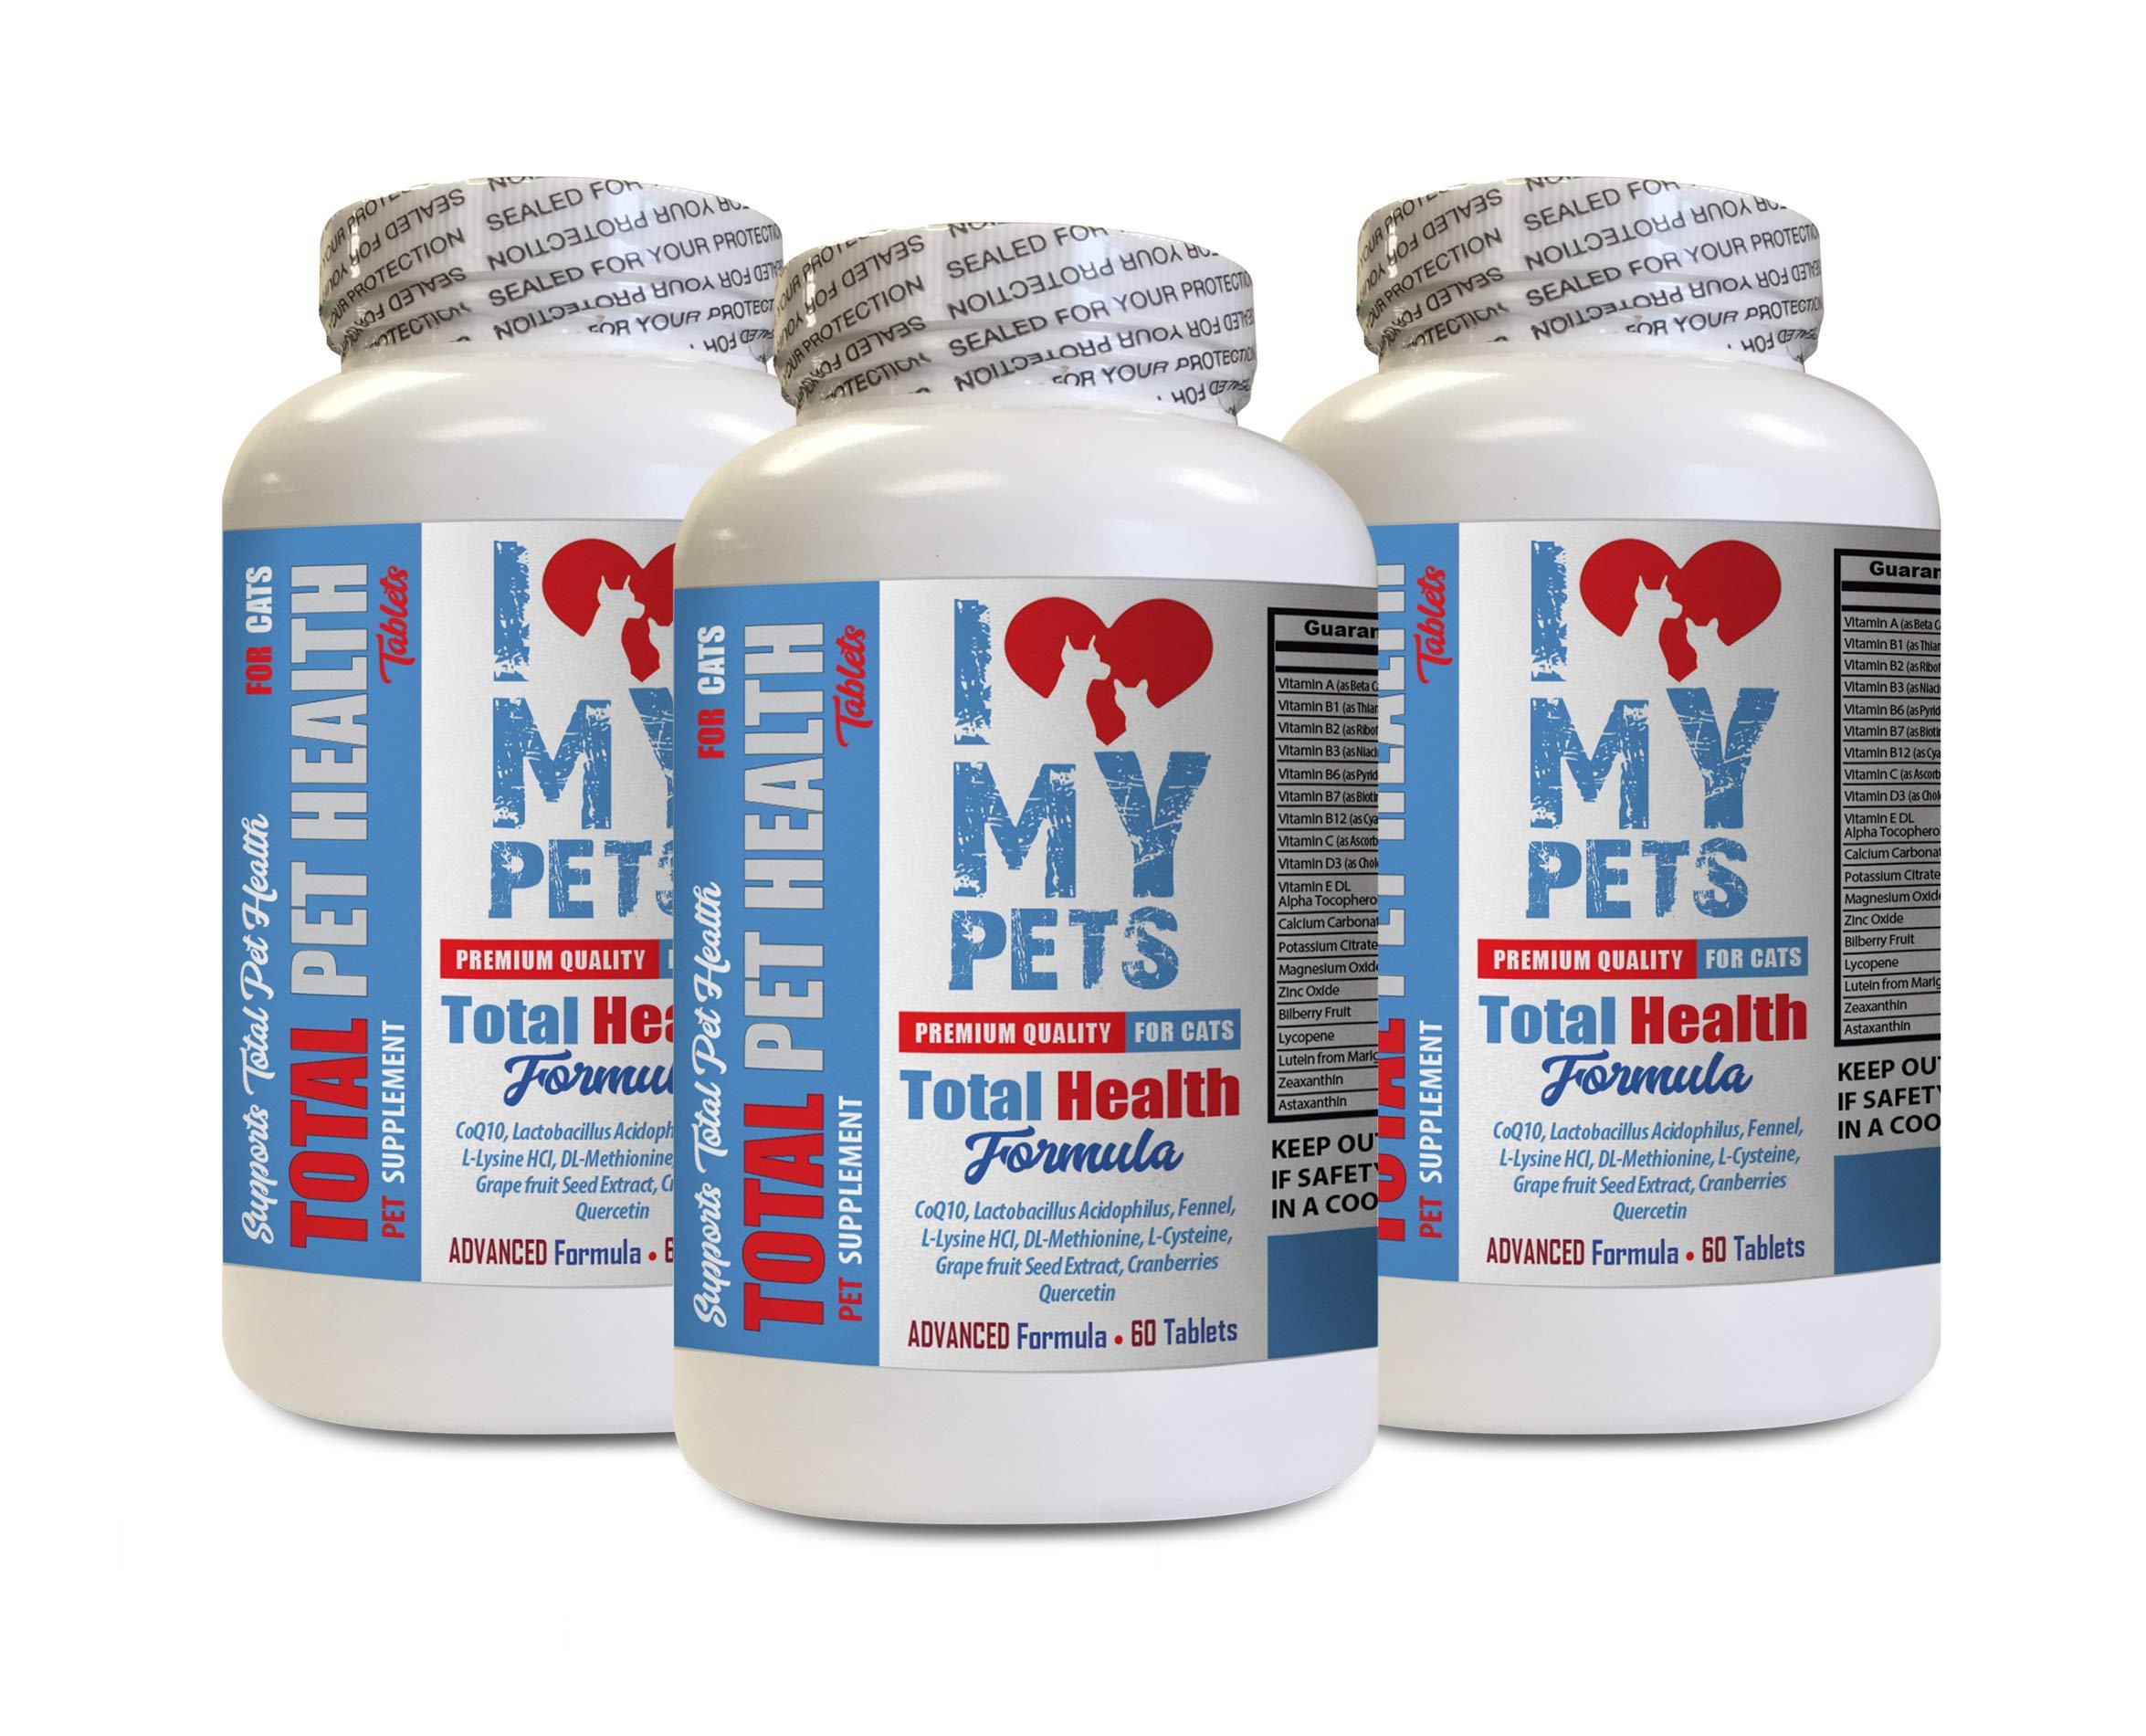 I LOVE MY PETS LLC cat Allergy Chews - Total PET Health for Cats - Premium Quality Formula - Chews - Vitamin c for Cats - 3 Bottles (180 Treats)